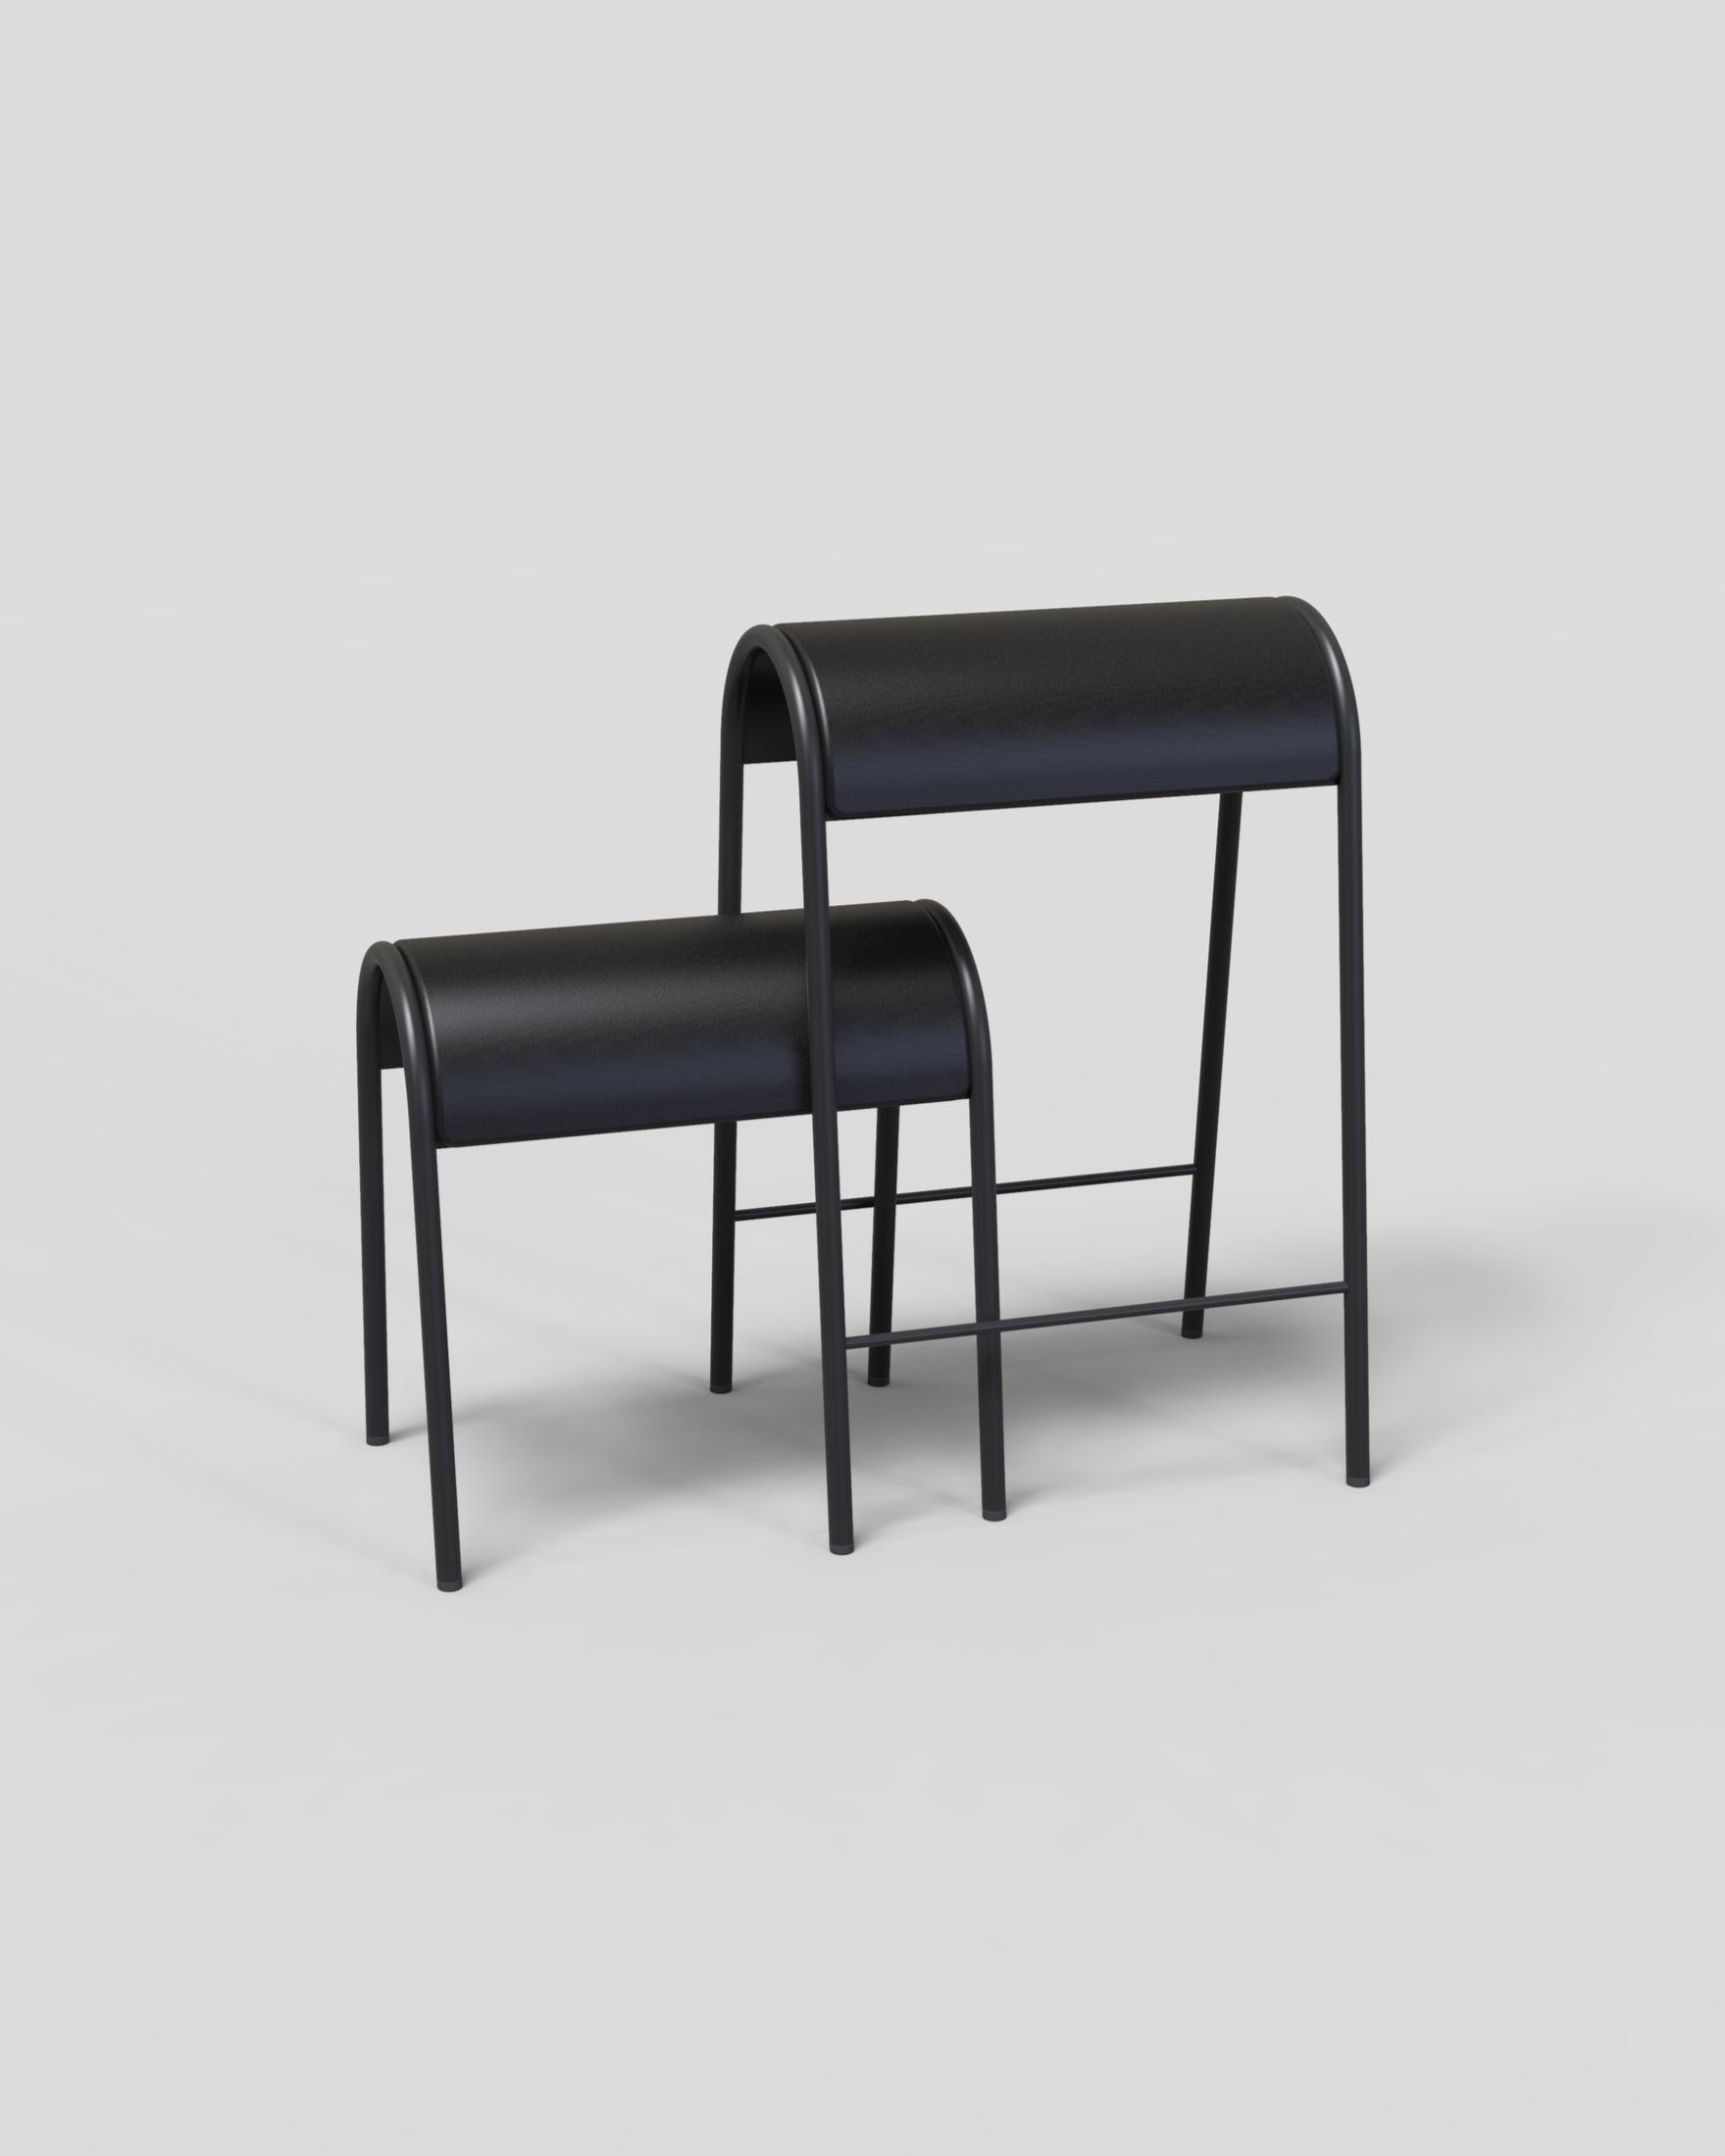 stool-ad.297.jpg